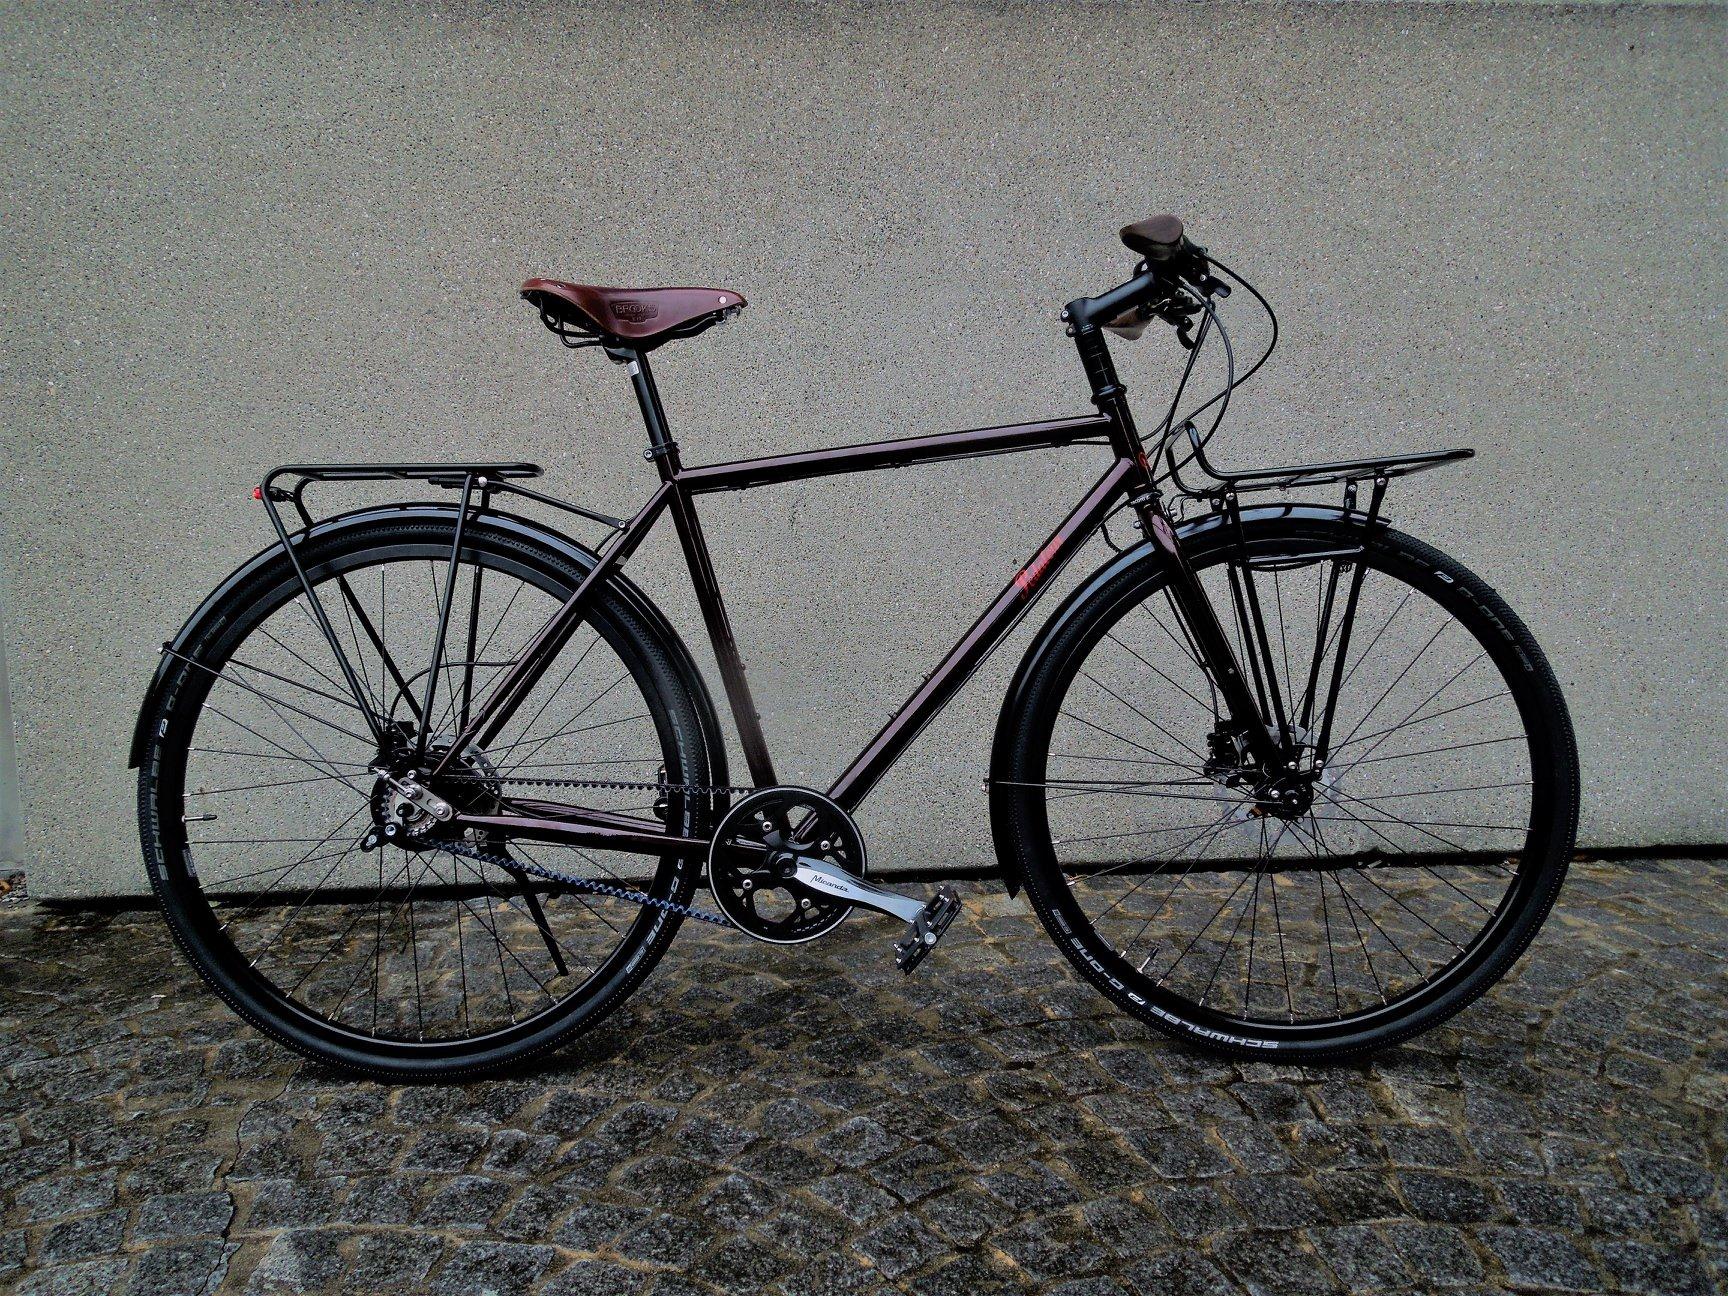 Pedaleur - Commuter Deluxe